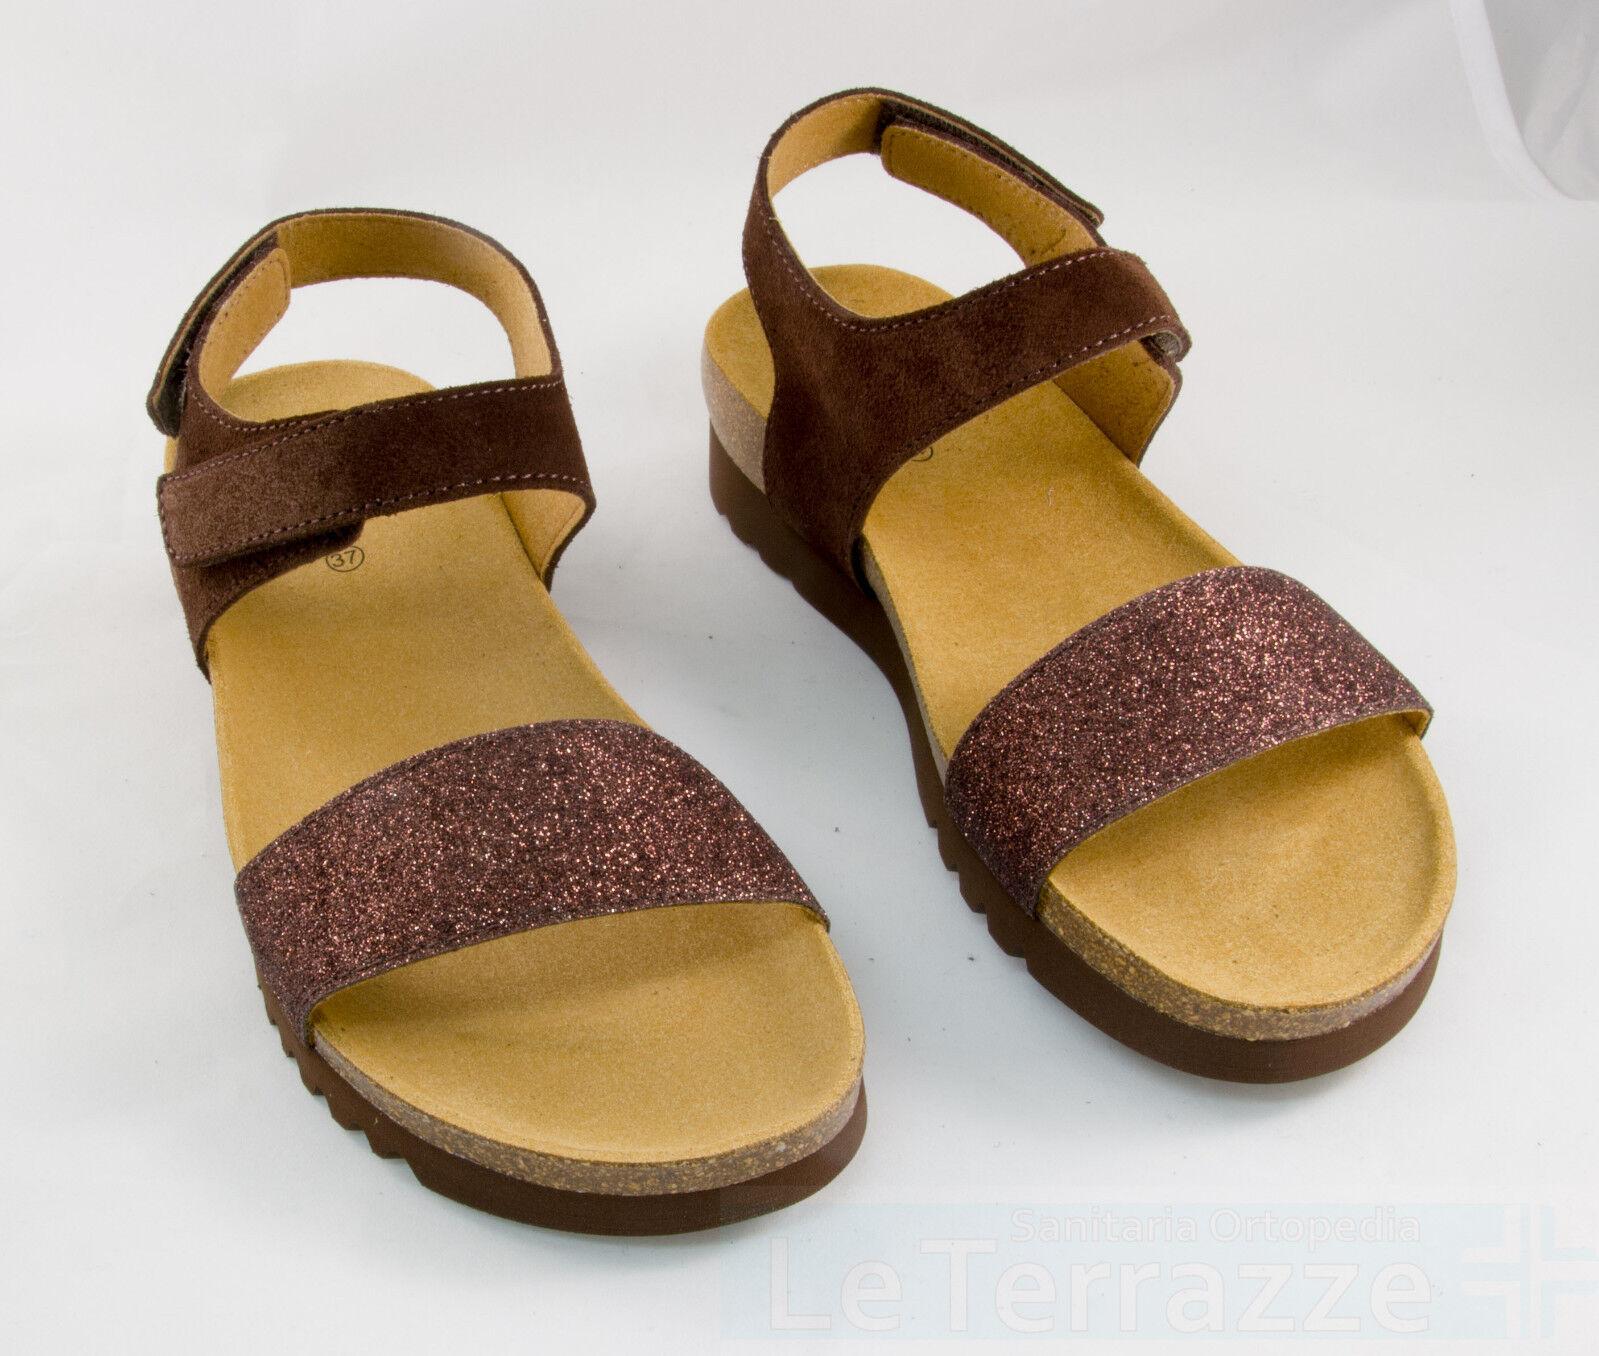 Dr Scholl Dores sandali bioprint pelle scamosciata SCONTO 10%